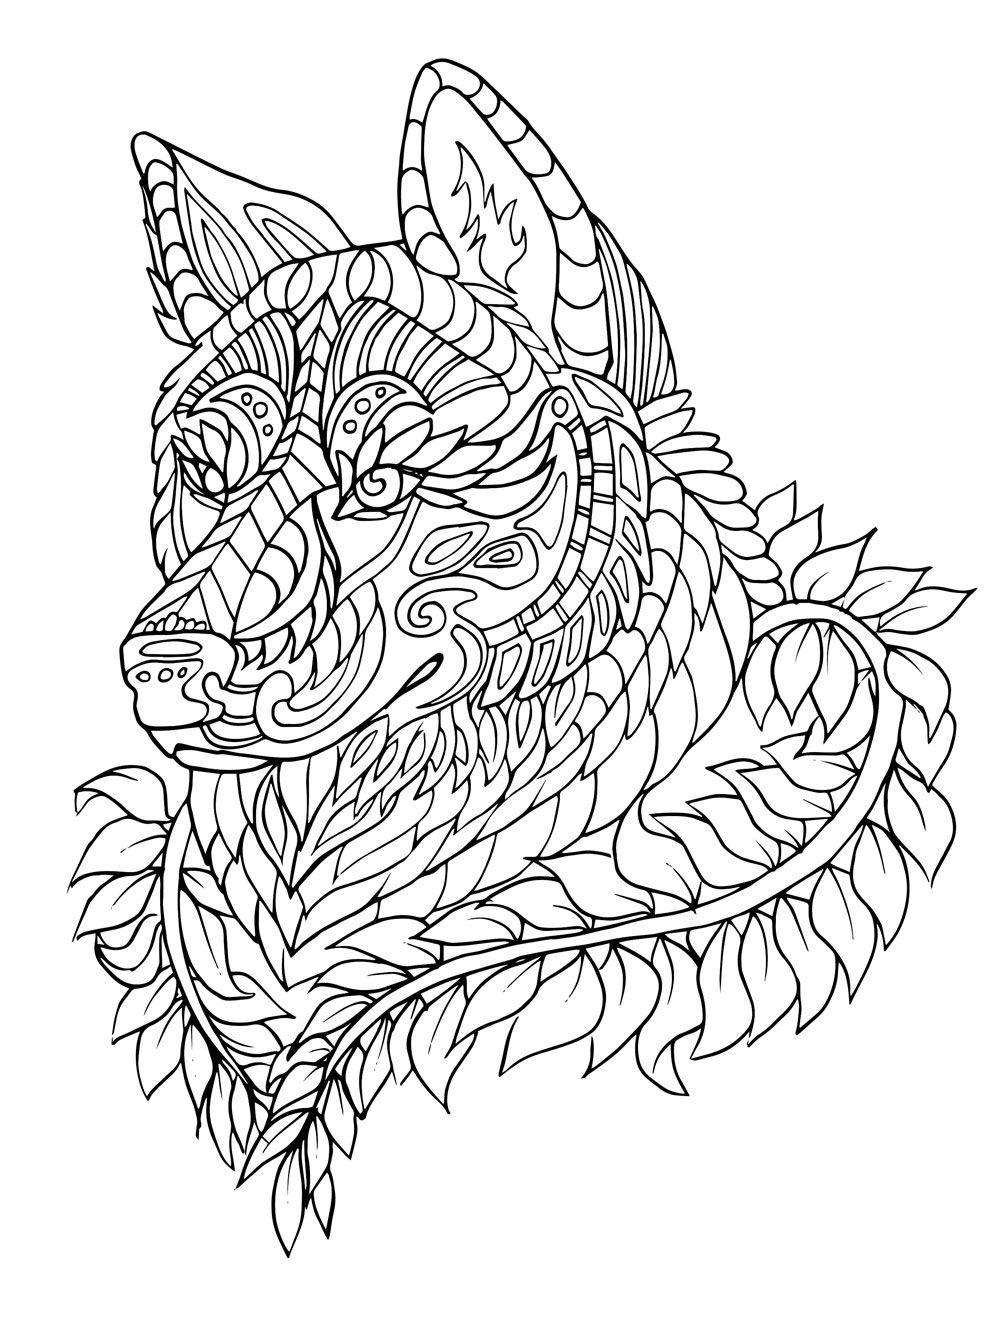 Www Bluestarcoloring Com Wp Content Uploads 2016 11 Wolf Coloring Pages Jpg Animal Coloring Pages Horse Coloring Pages Coloring Pages